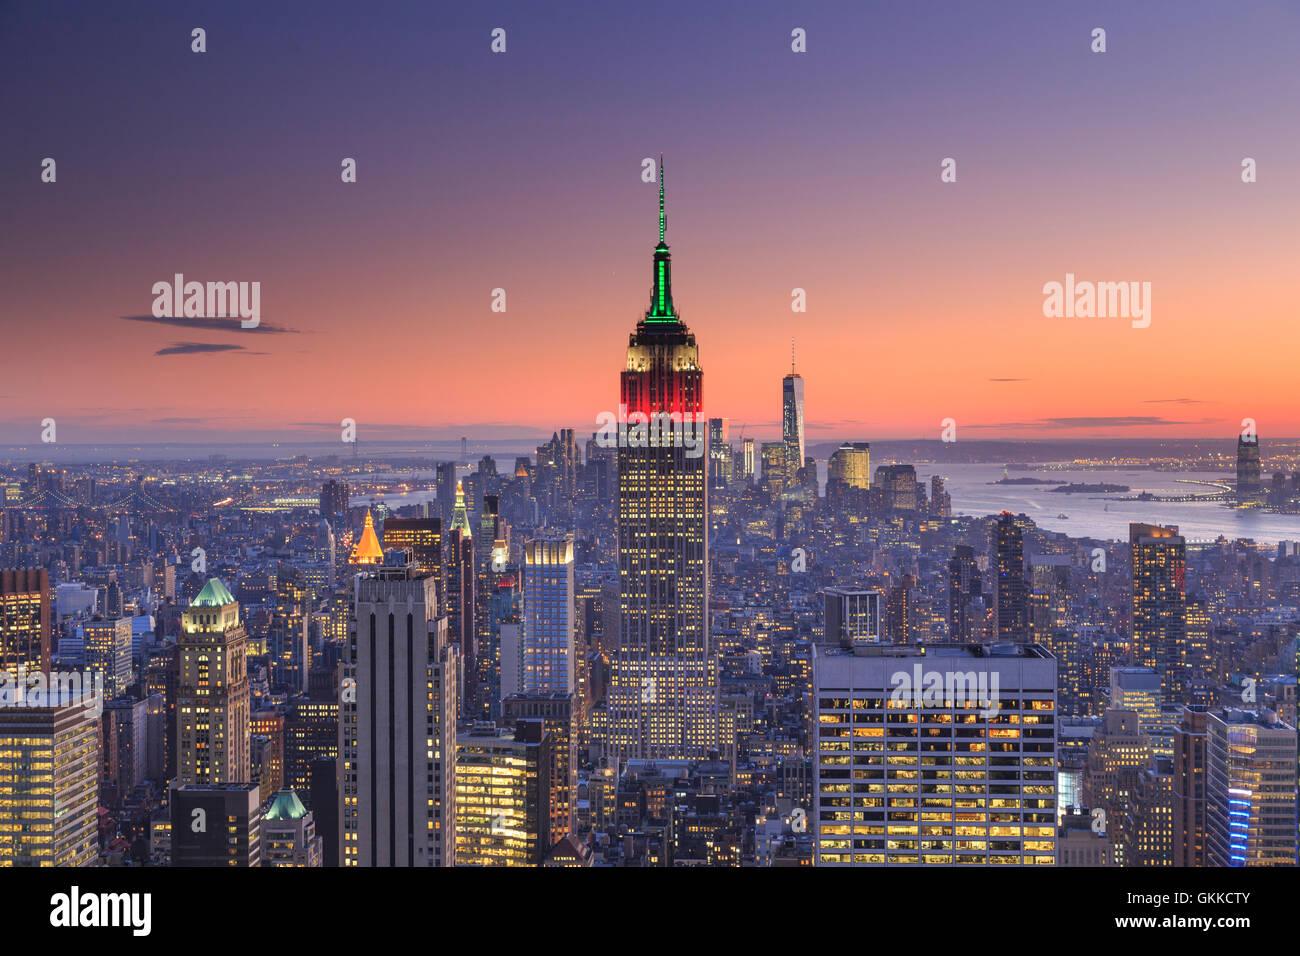 USA, New York, New York City, Empire State Building und Midtown Manhattan Skyline Stockbild